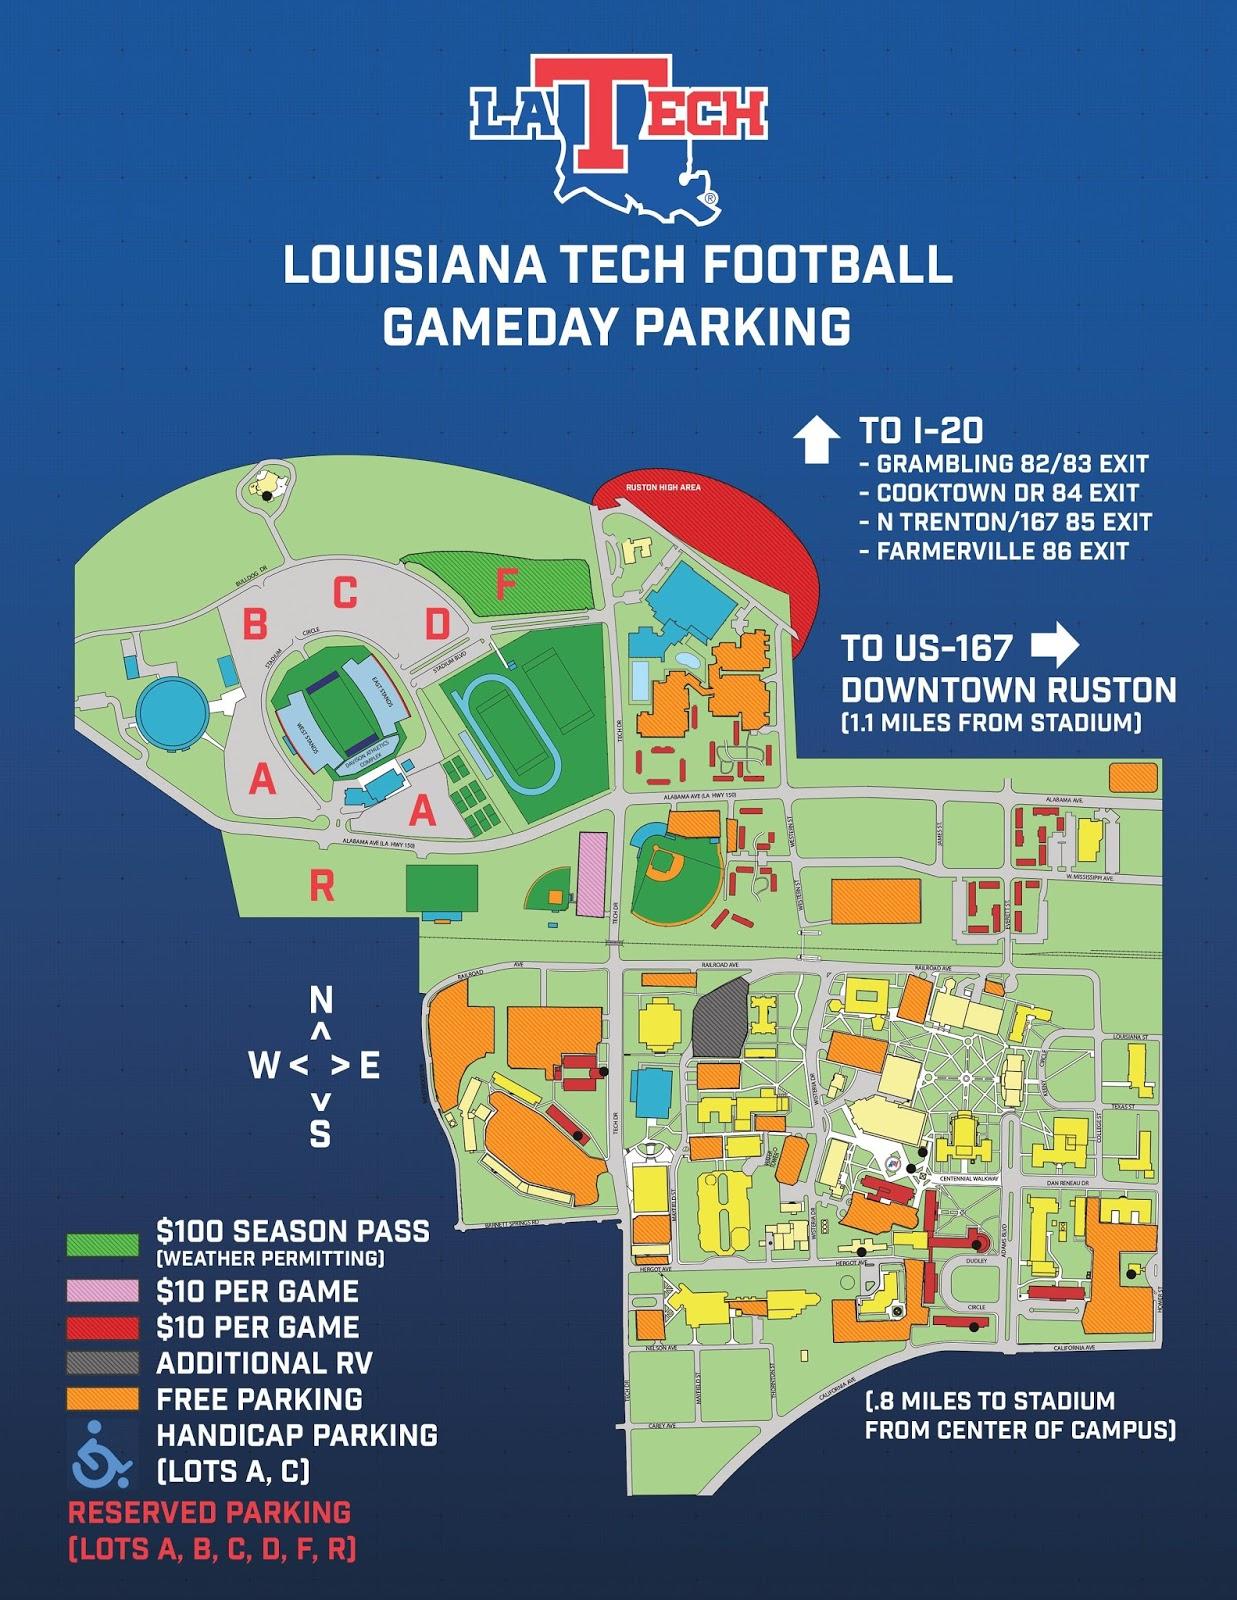 louisiana tech campus map Experience Ruston Tech Game Day For Dummies louisiana tech campus map